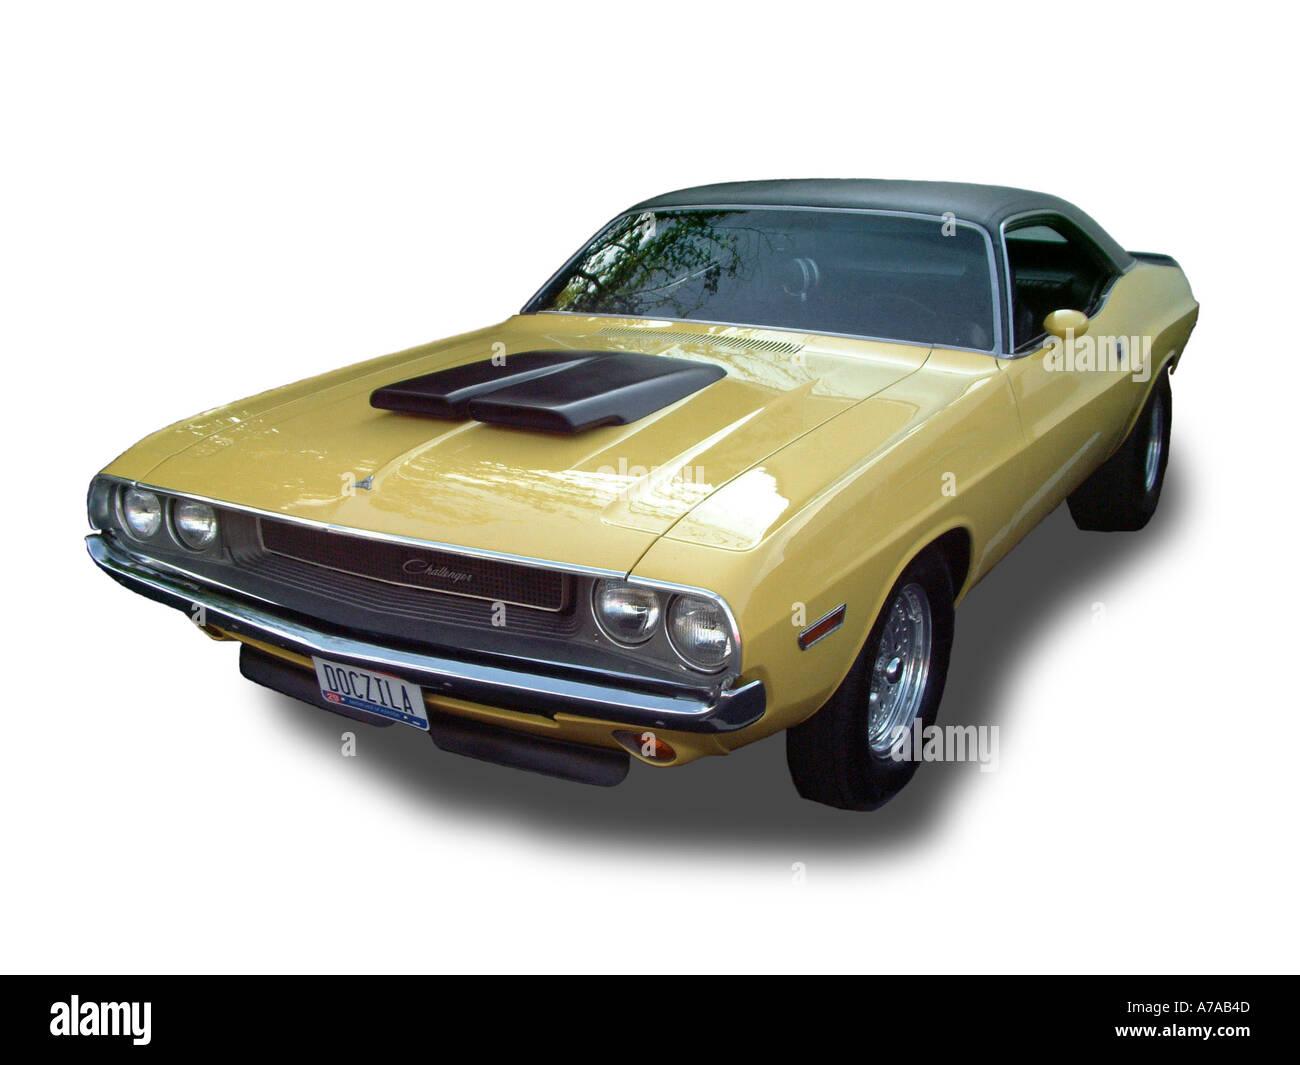 1970 Dodge Challenger DOCZILA - Stock Image